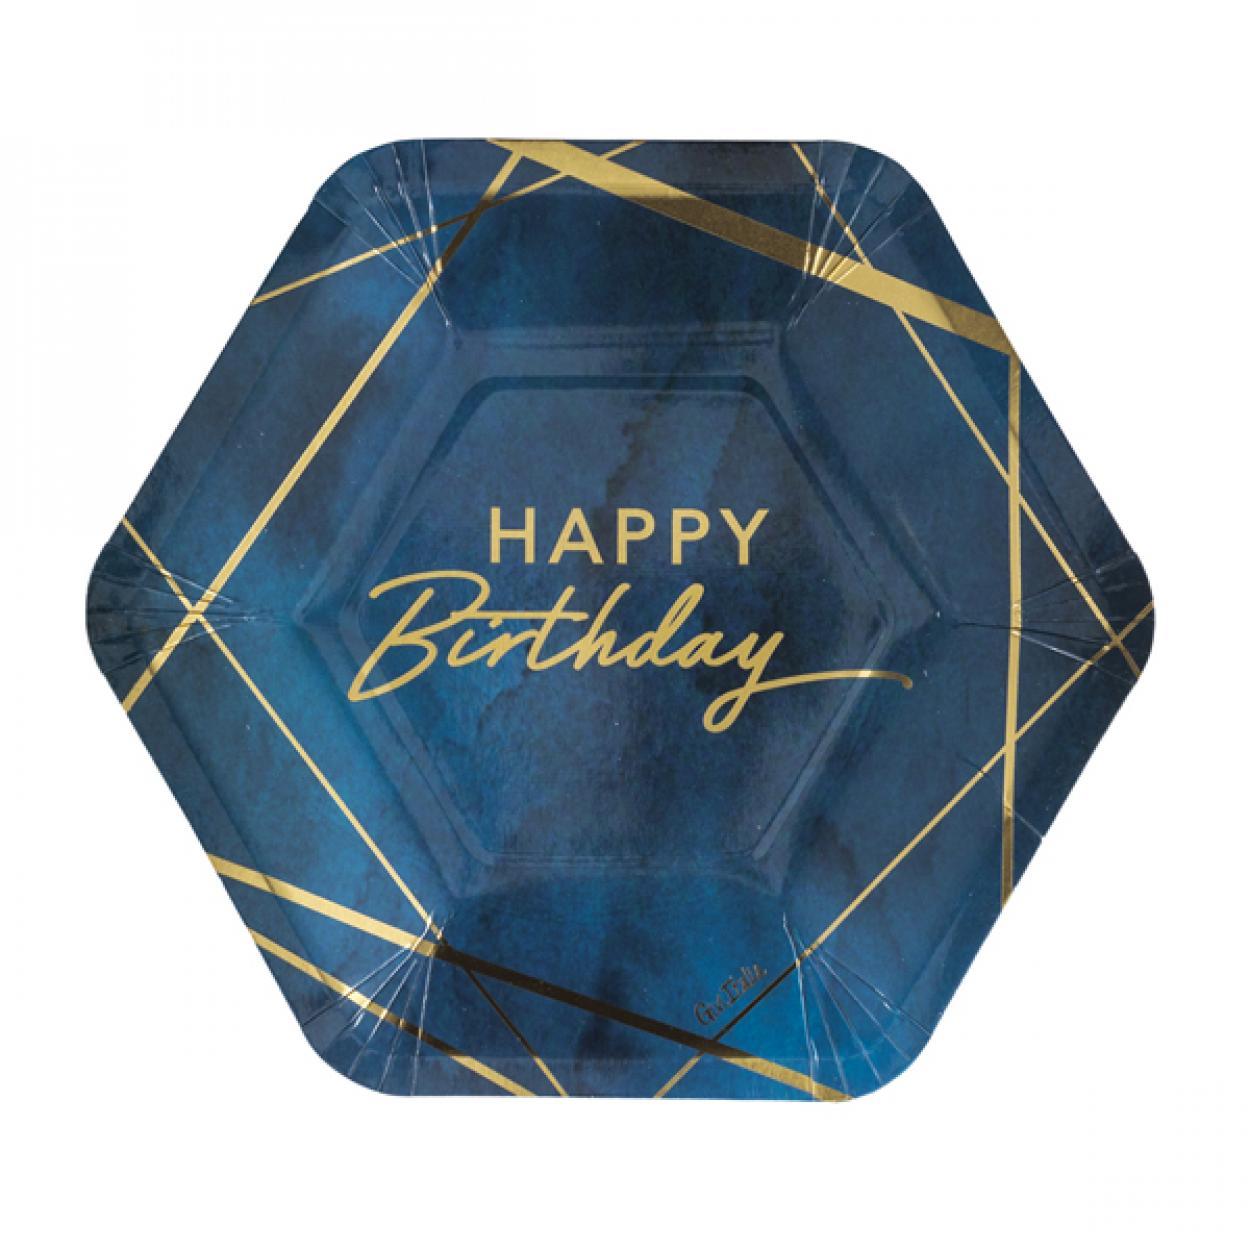 8 PIATTI CM23 ESAGONALI BIRTHDAY BLUE 64116